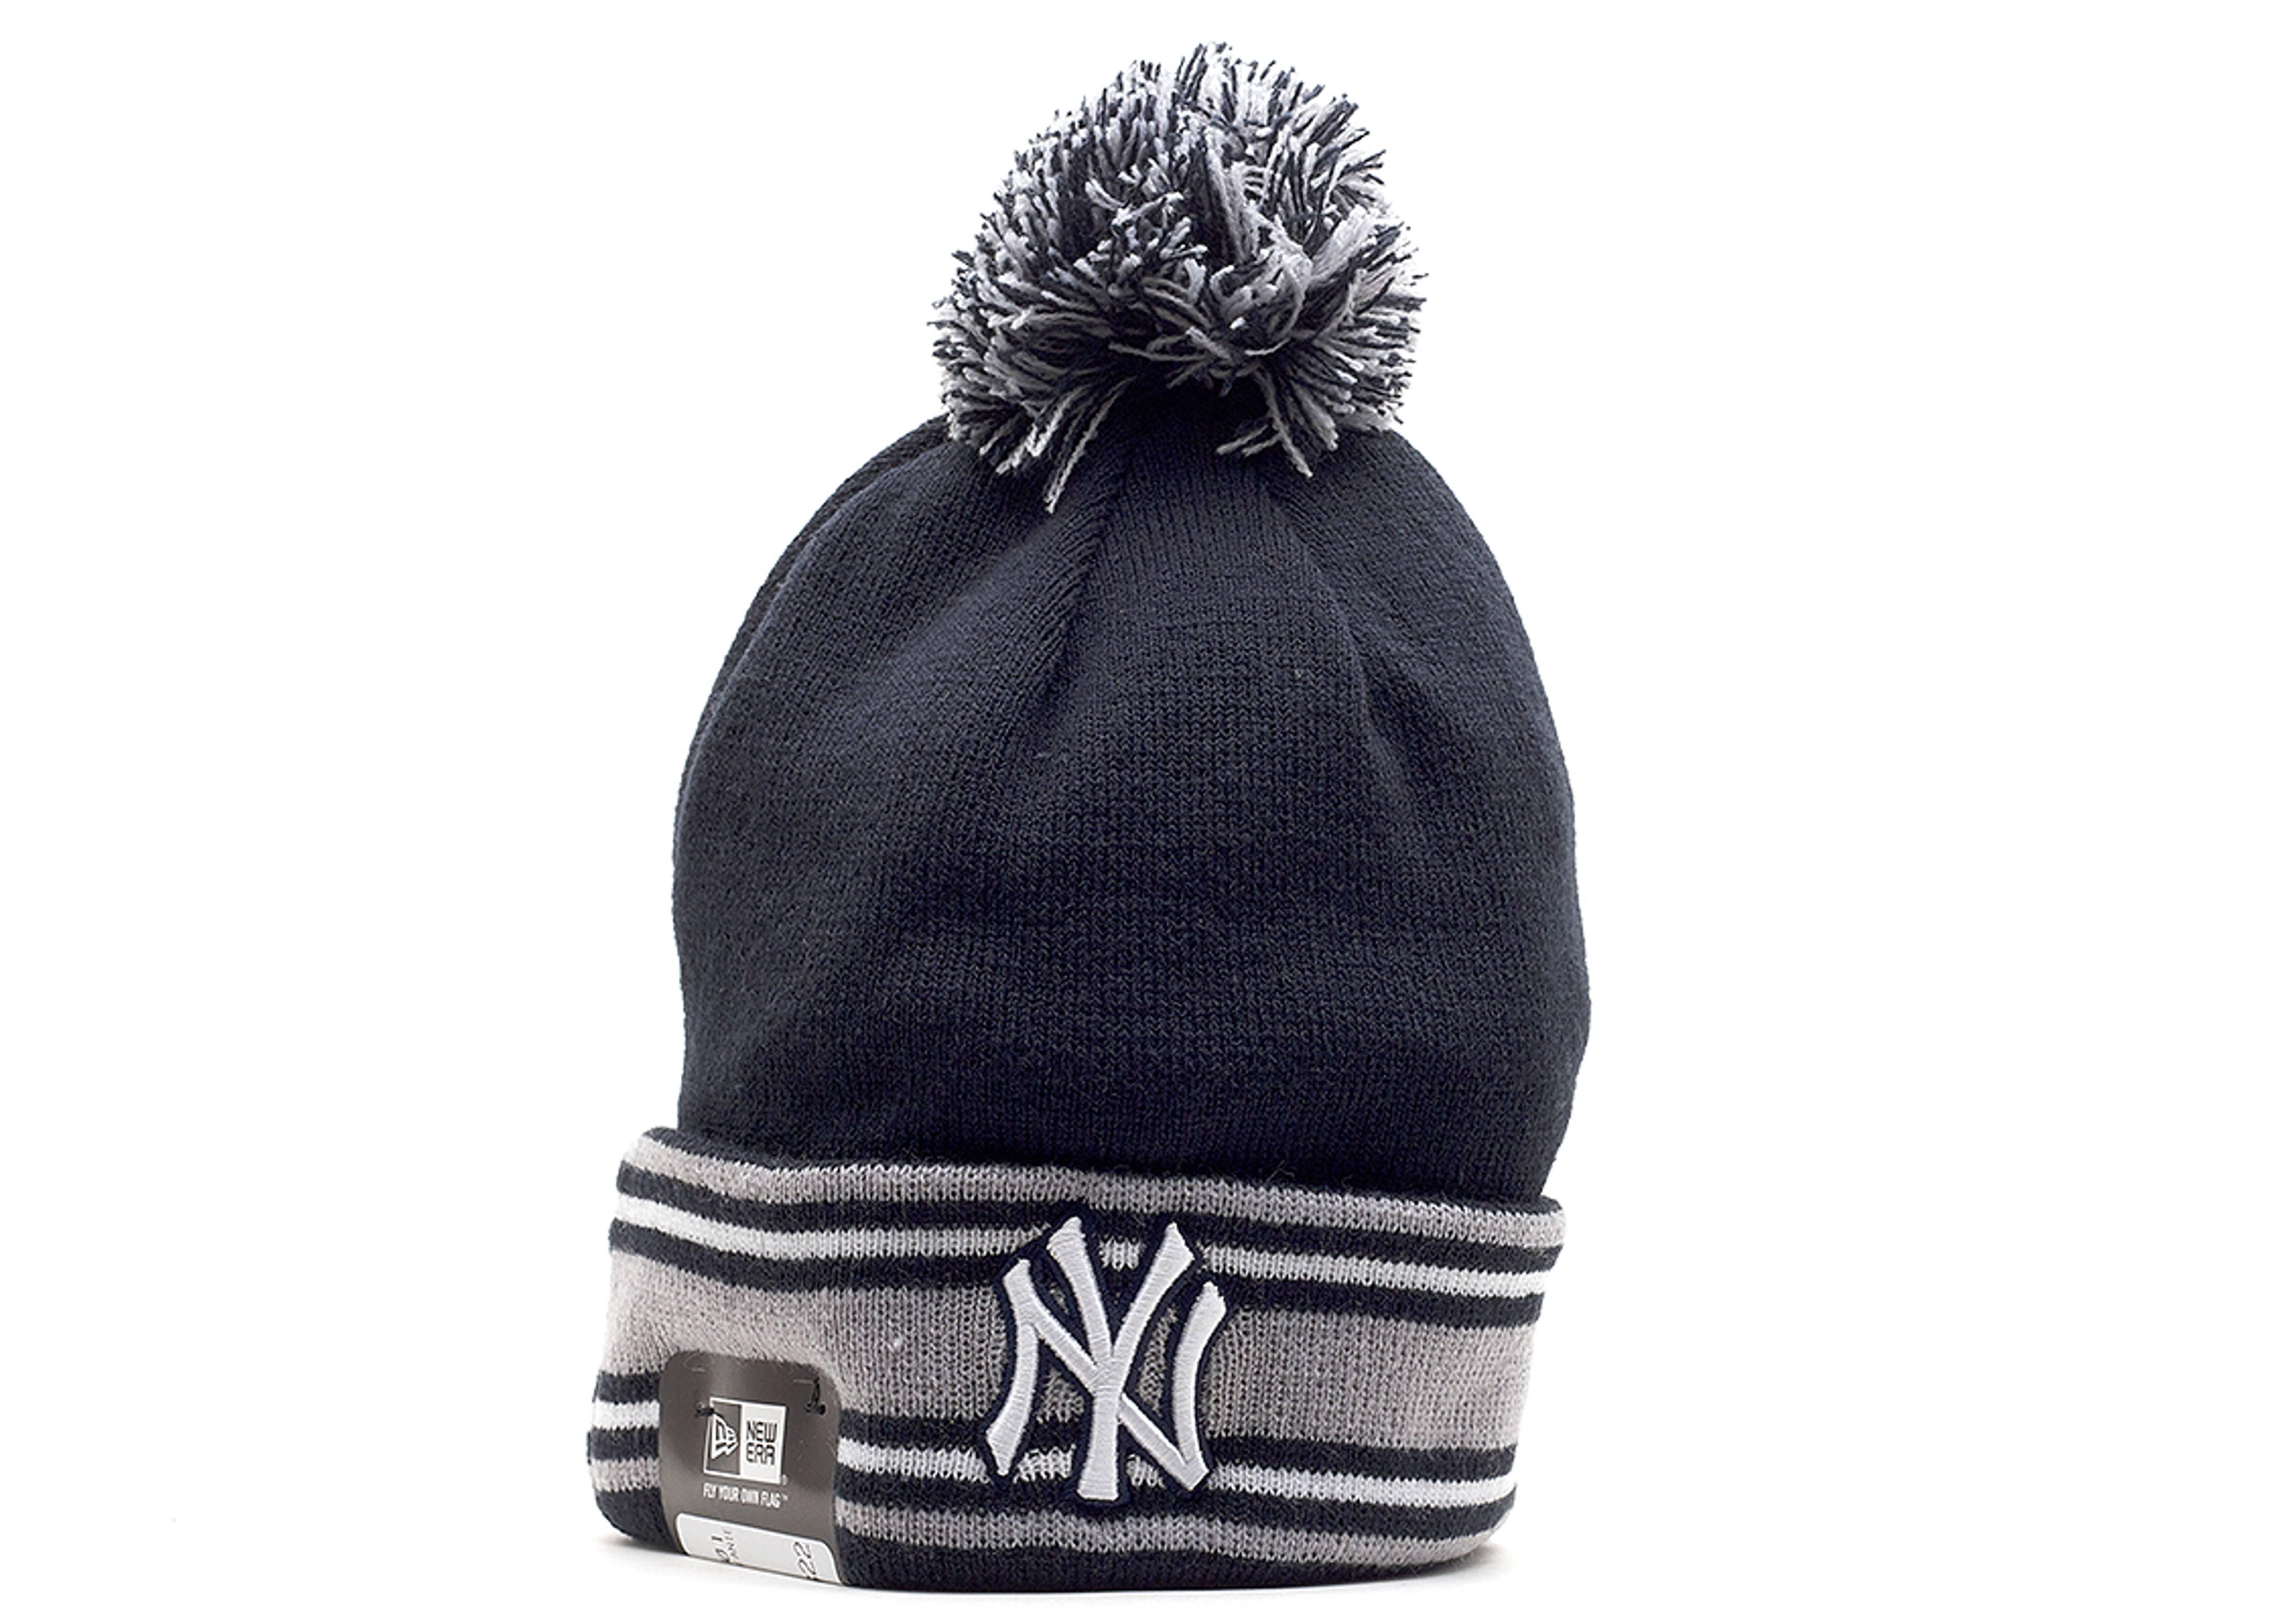 4a03fd0b2f0 New York Yankees Cuffed Pom Knit Beanie - New Era - 10963897 - navy ...